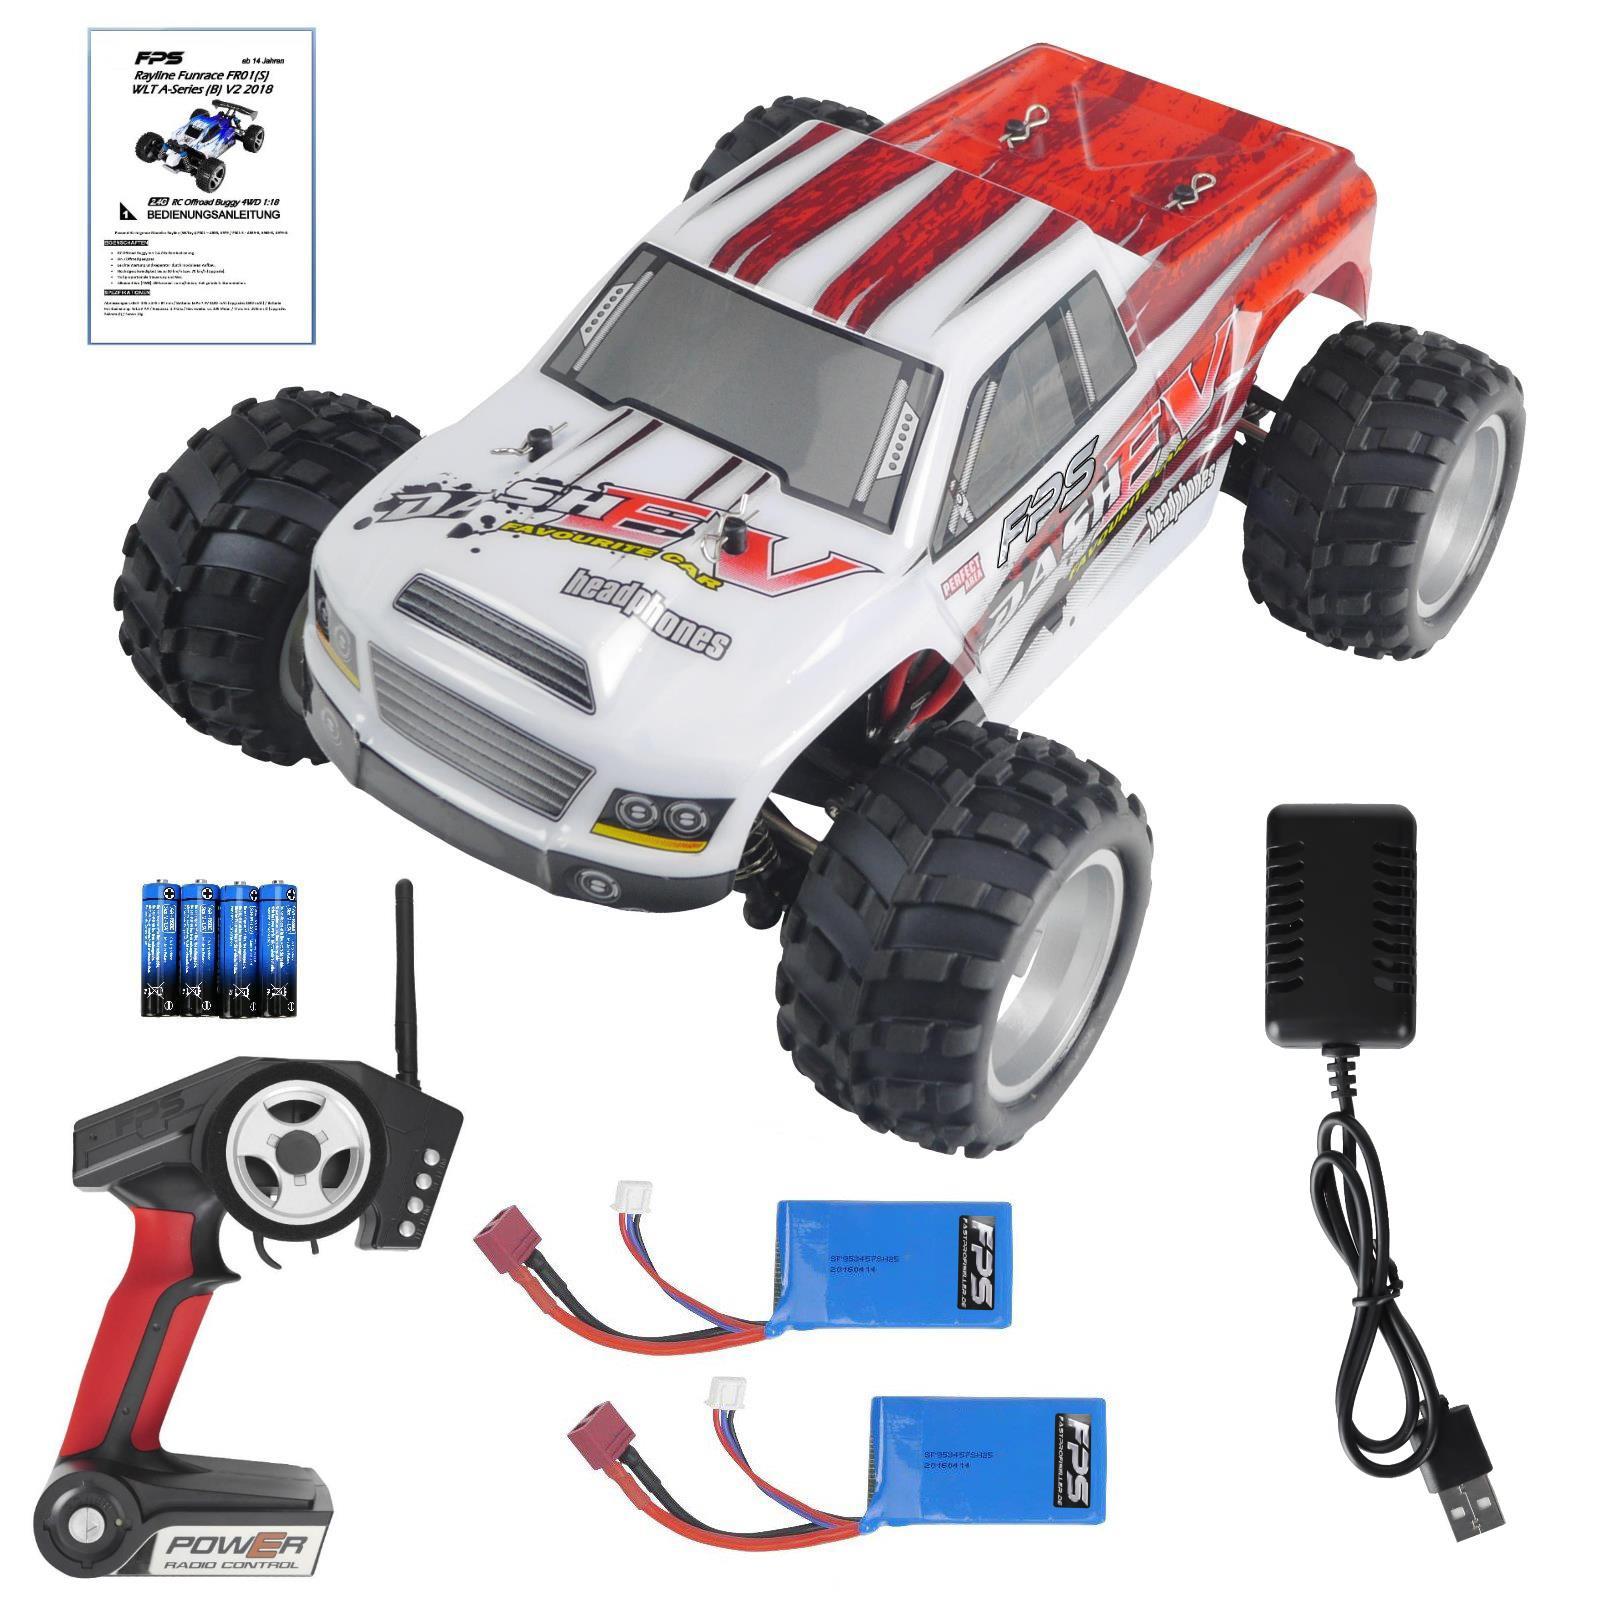 Rayline Funrace 01 S FR01 S RC Monster Truck mit Zubehör 2x Akku